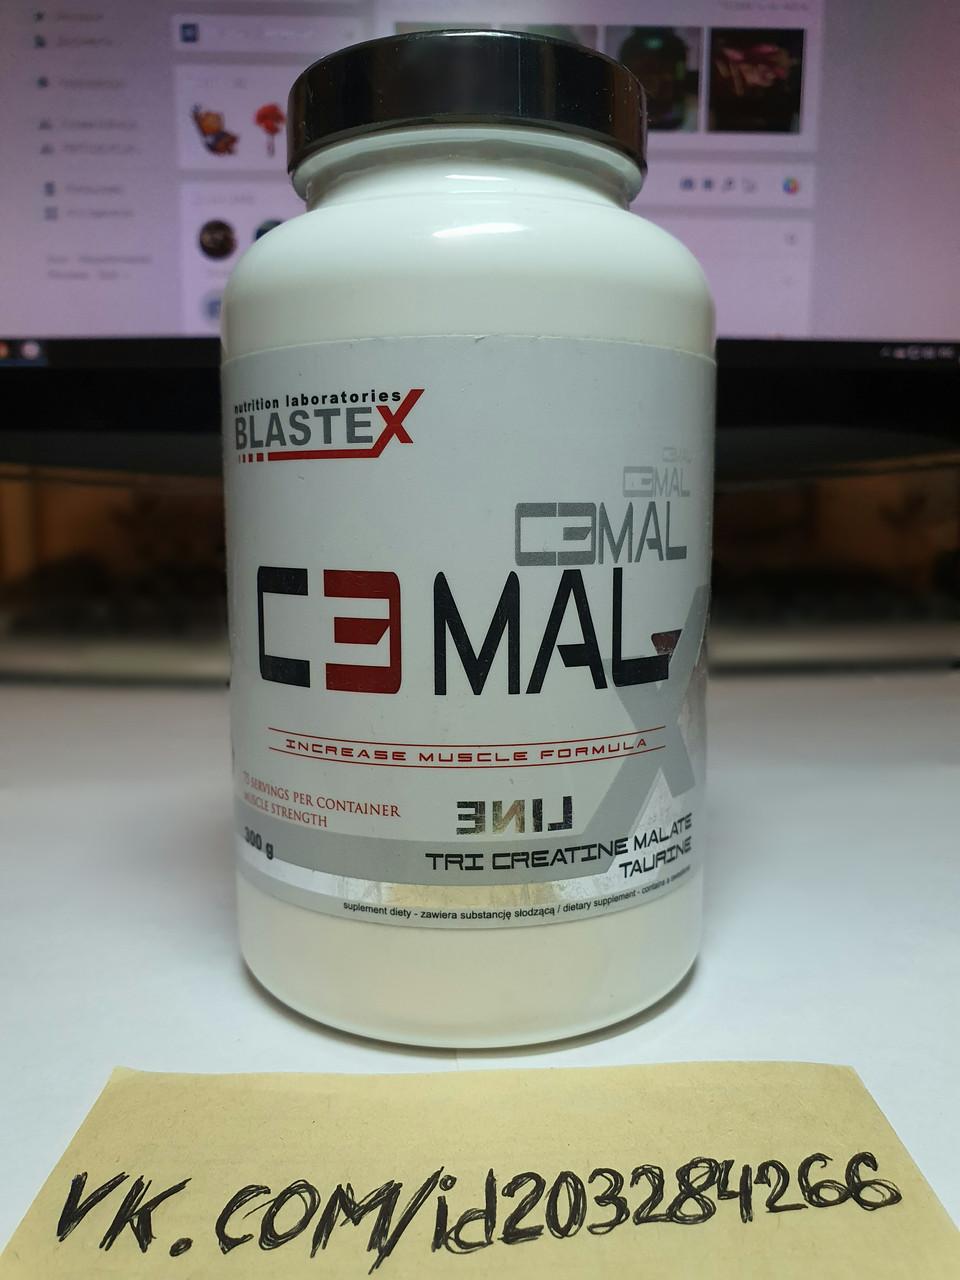 Креатин малат Blastex Xline C3Mal 300g